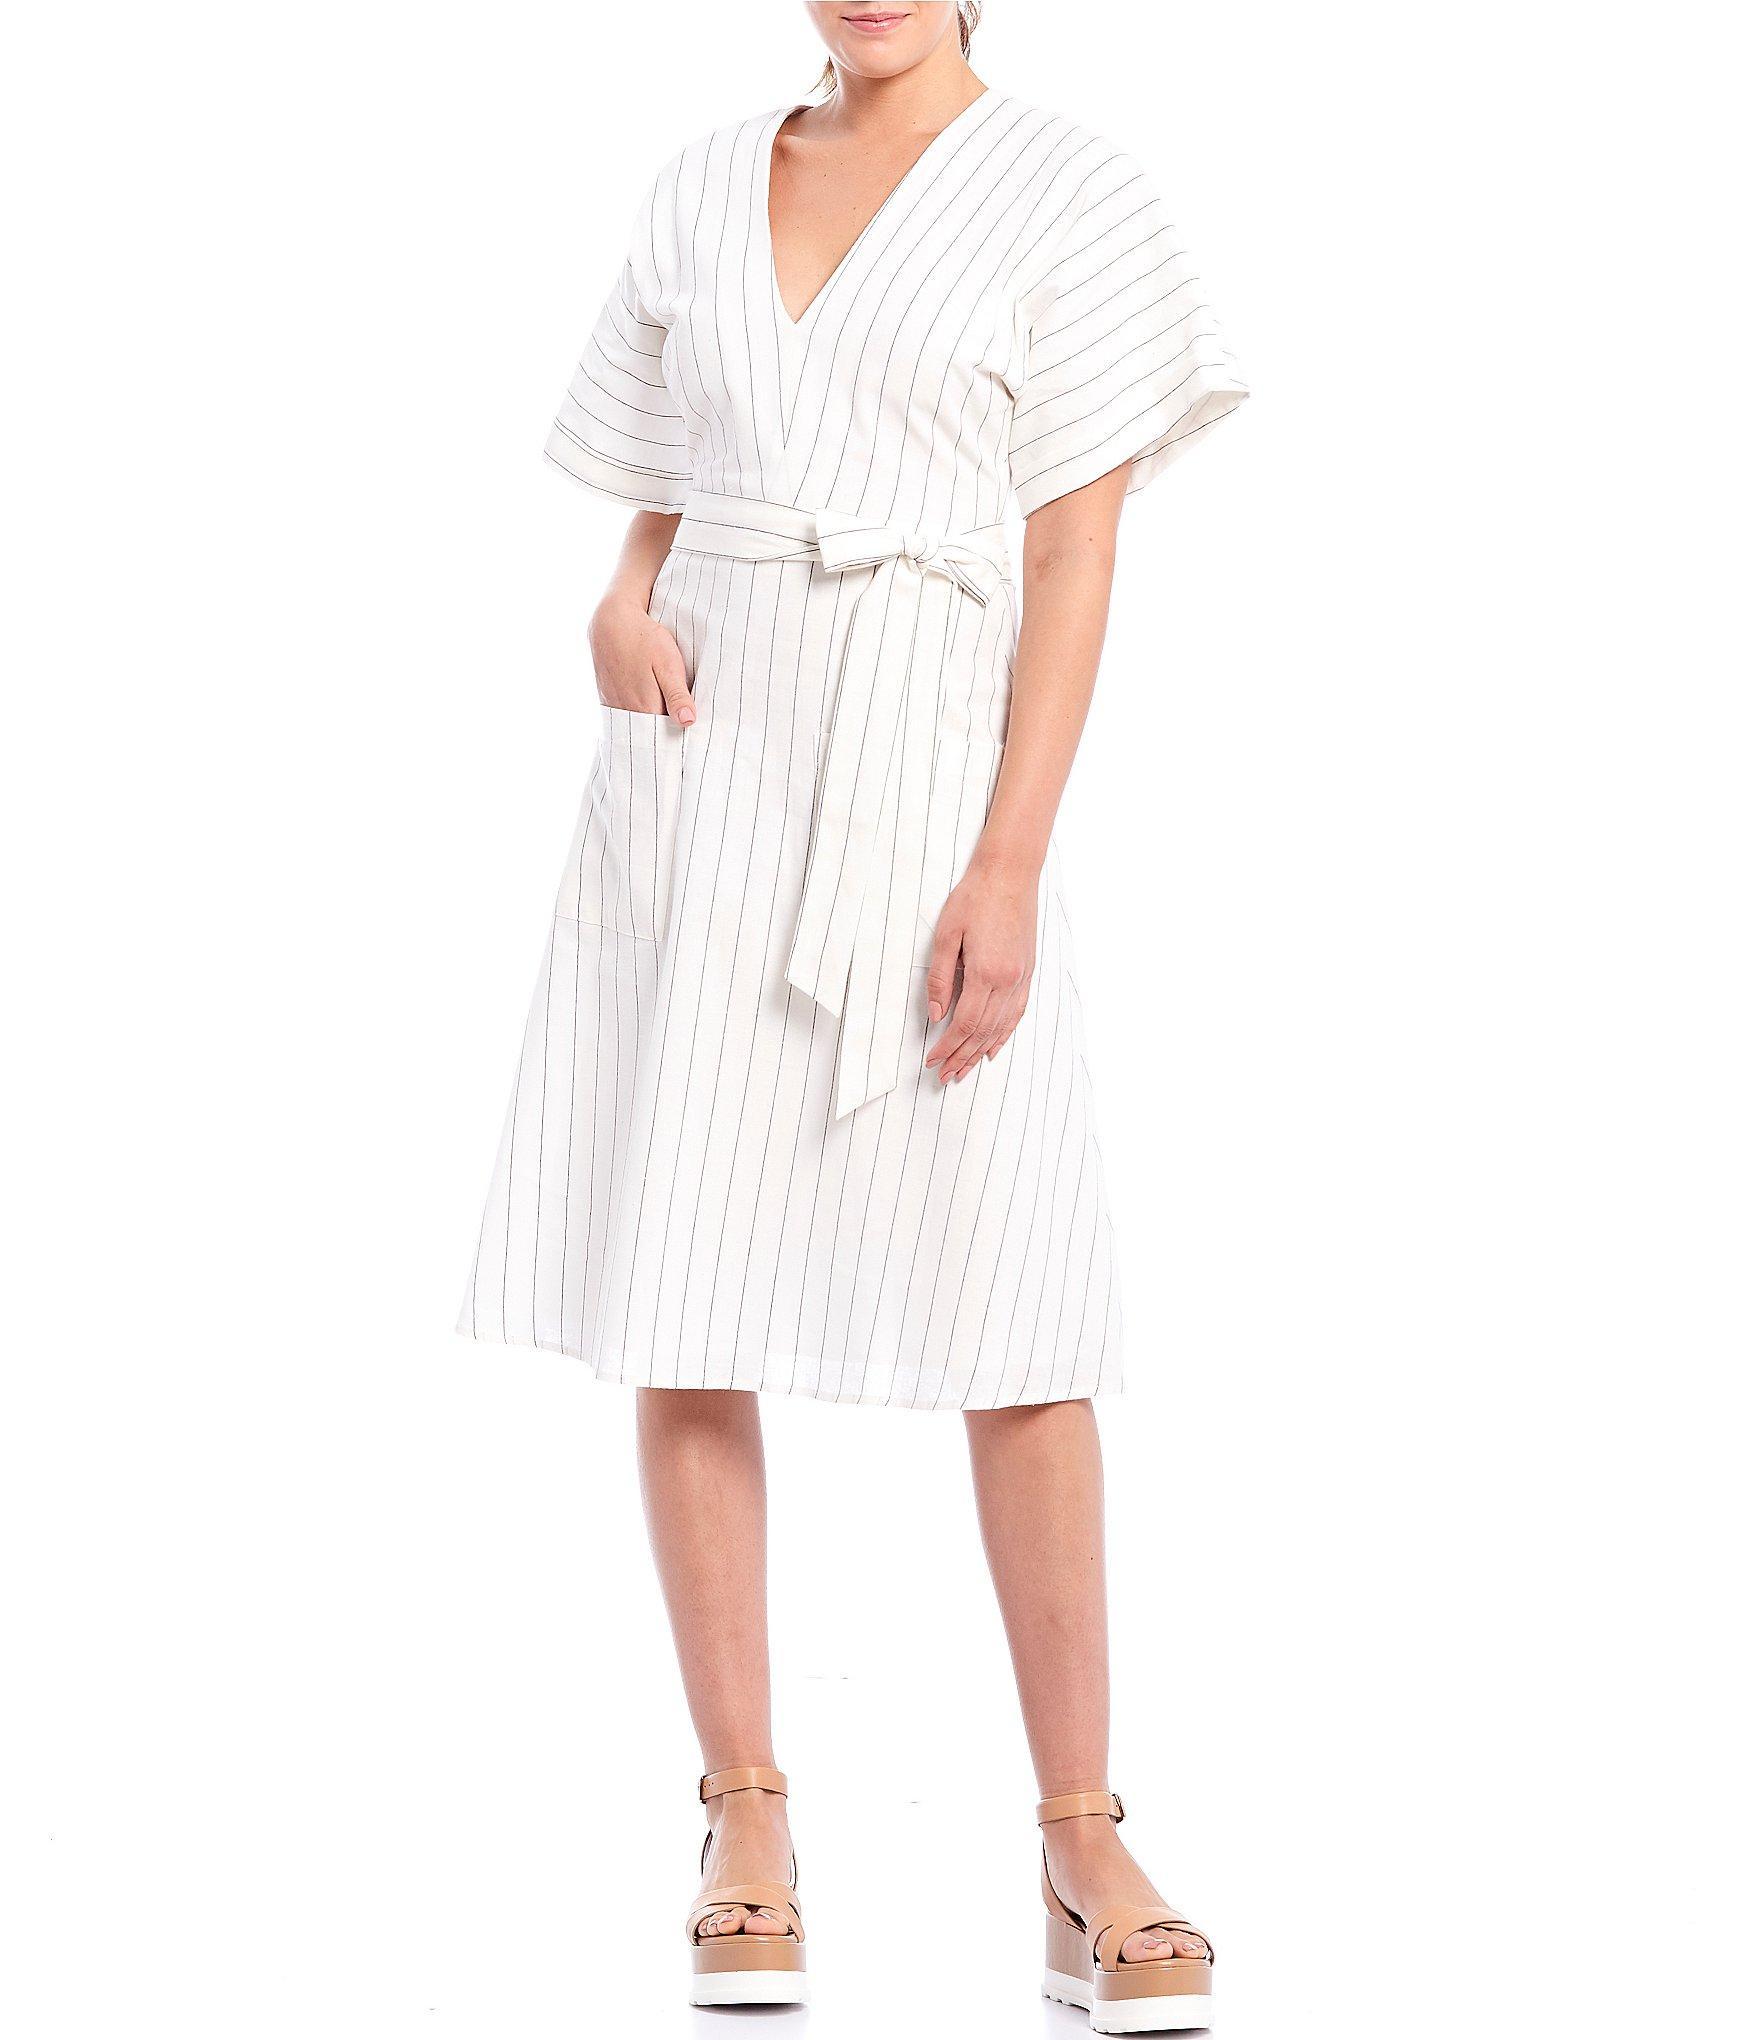 d6f10dc99 Gianni Bini Lauren Pinstripe Tie Waist A-line Midi Dress in White ...